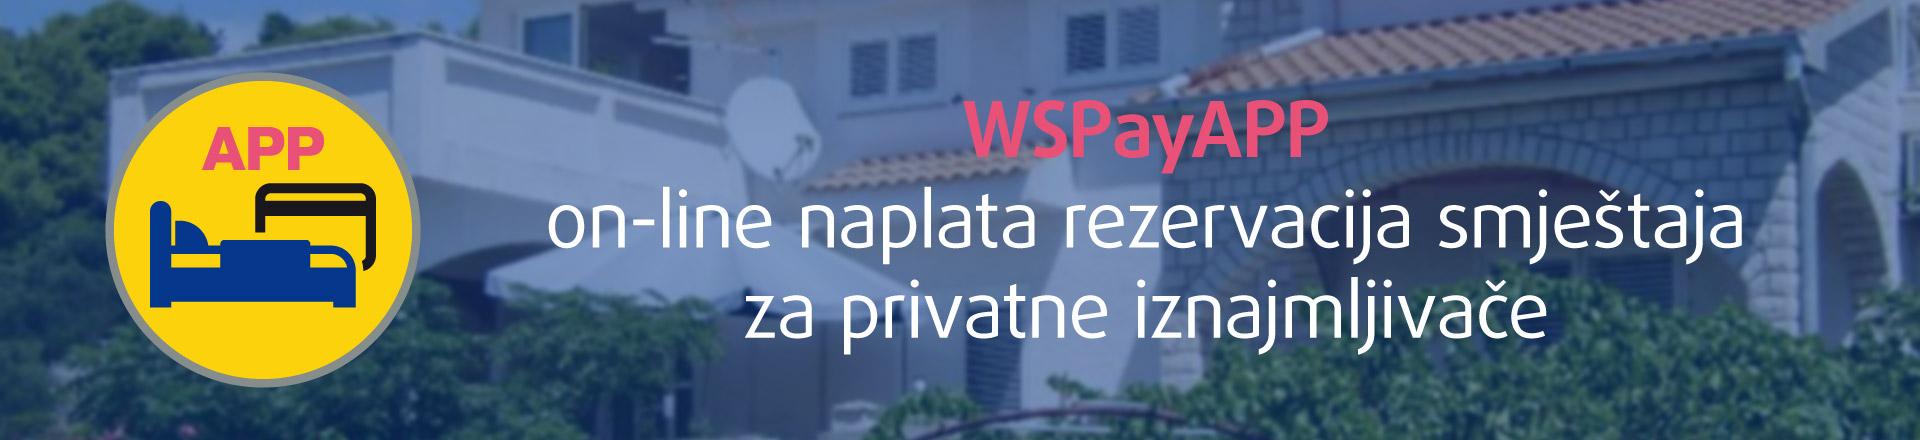 https://www.wspay.info/Repository/Banners/WSPayAPP-1920x440.jpg